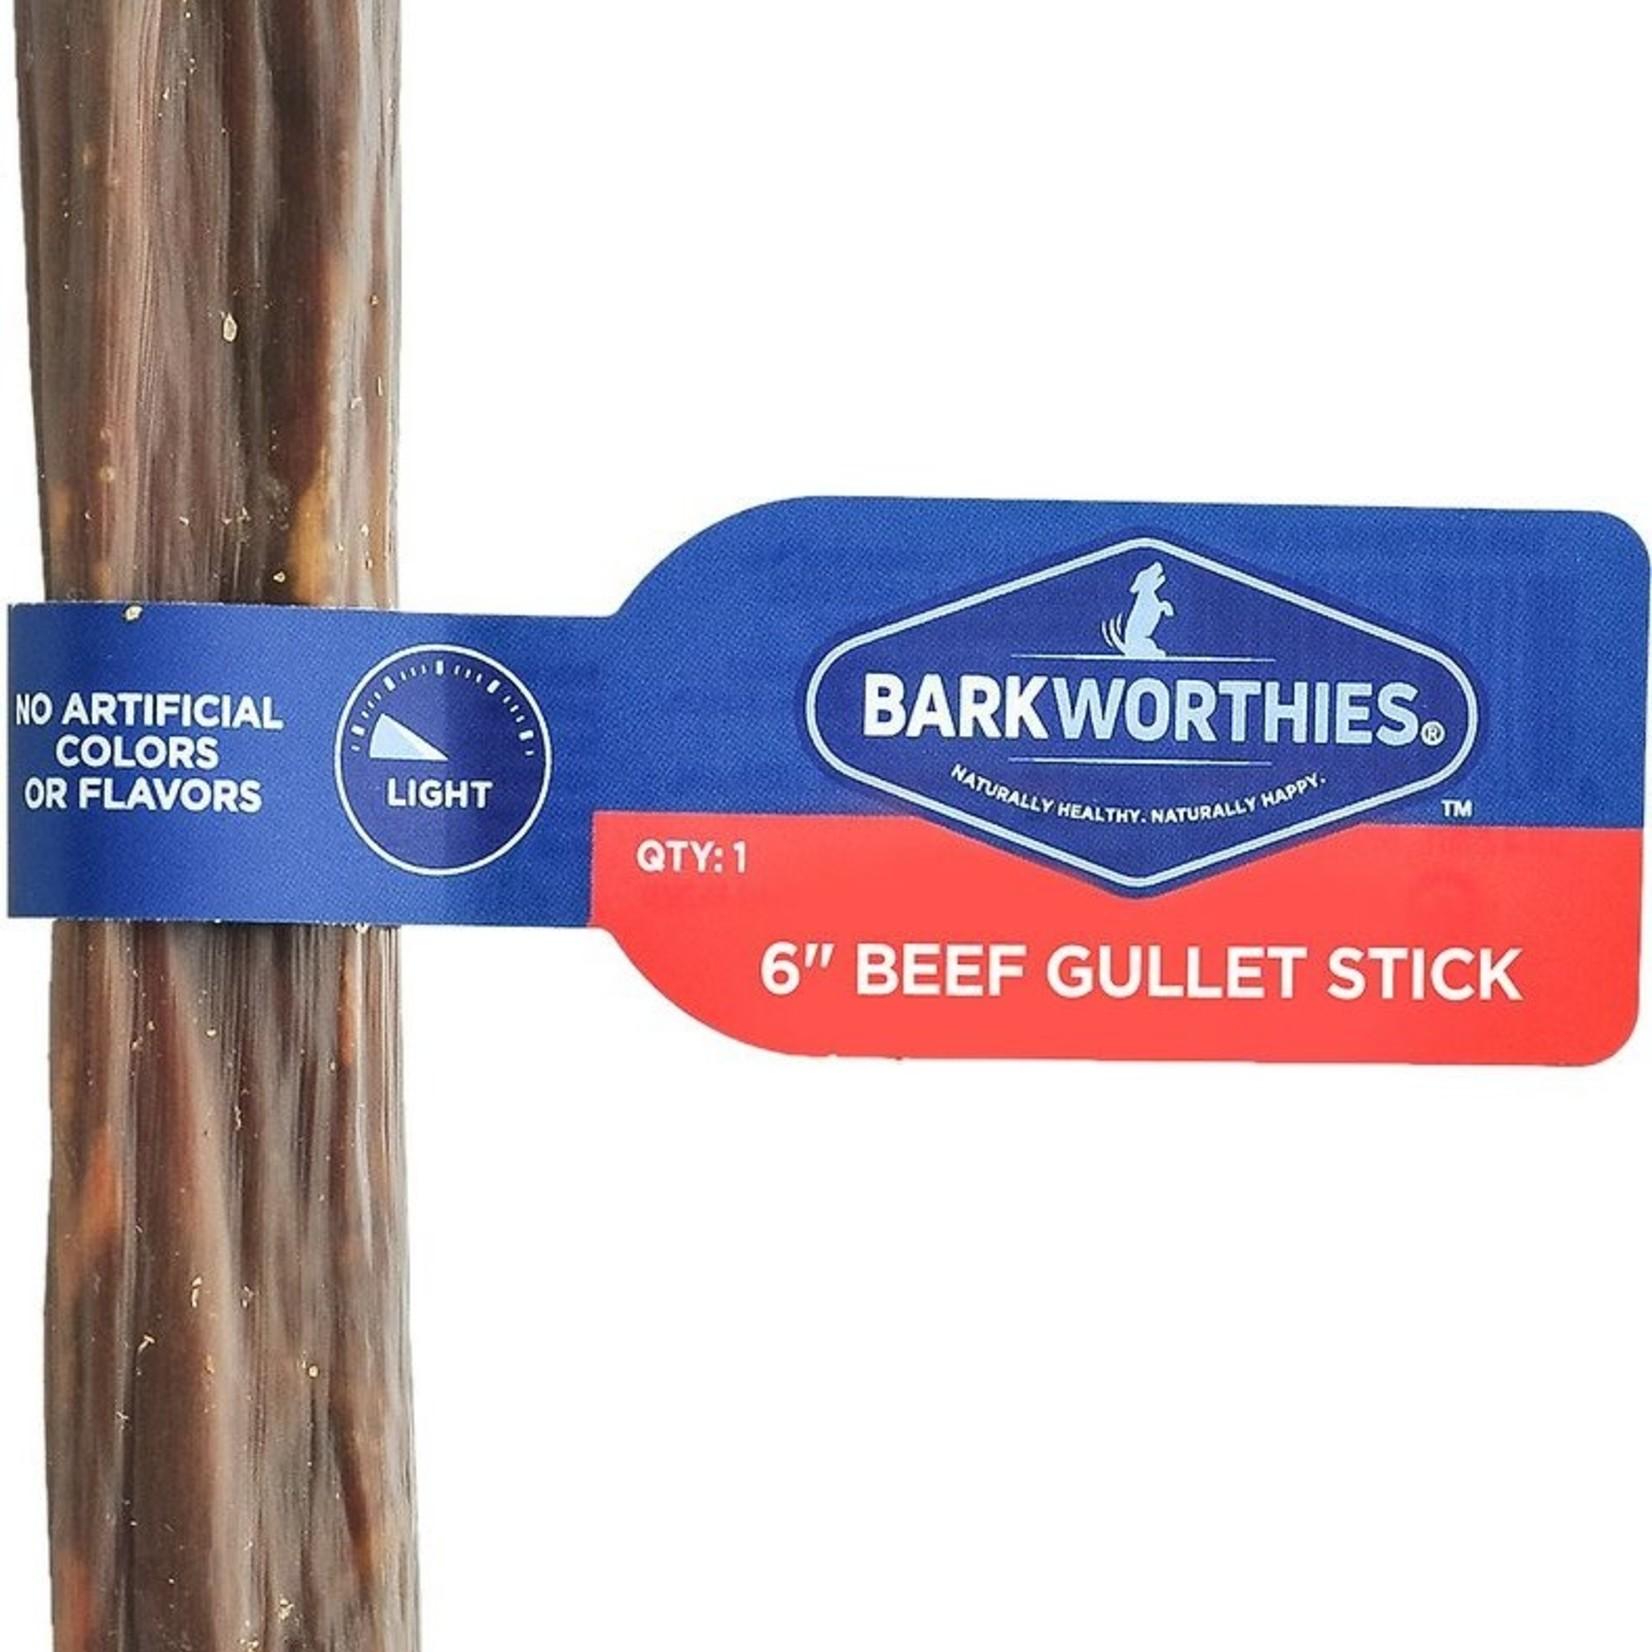 "Barkworthies Barkworthies Beef Gullet Stick 6"""